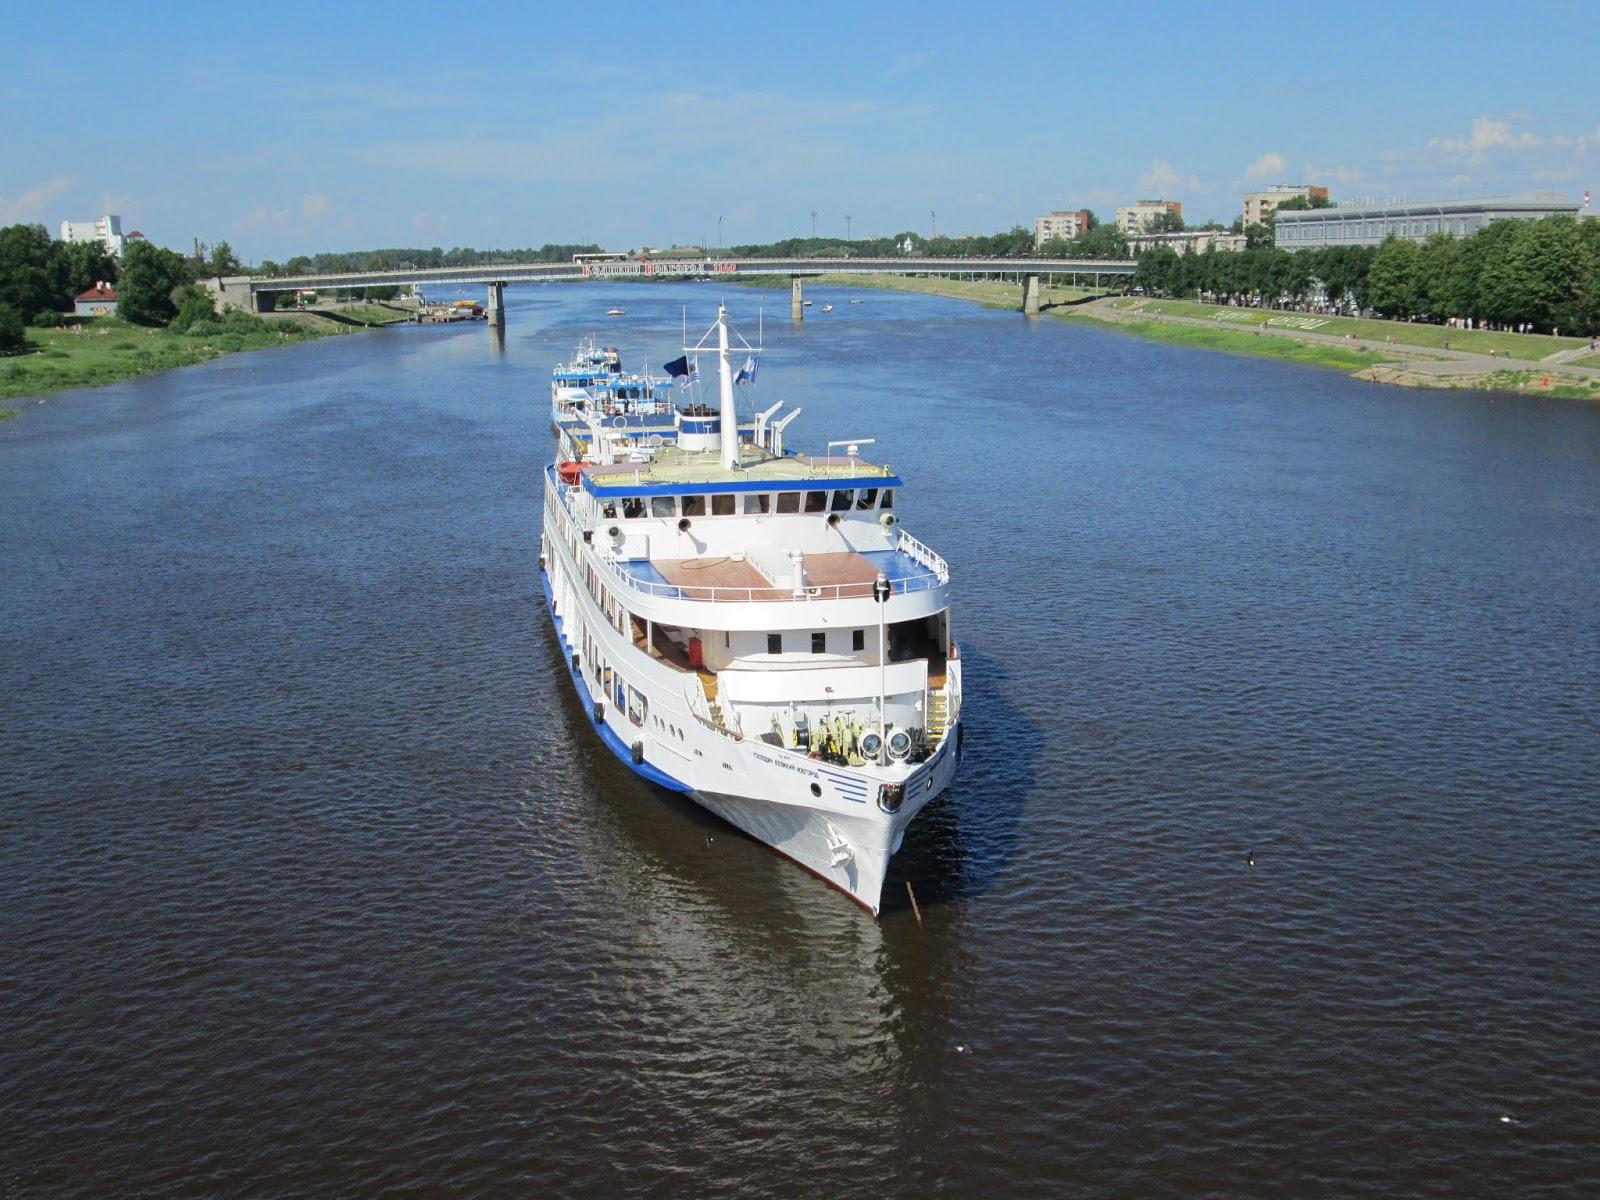 Господин Великий Новгород на реке Волхов